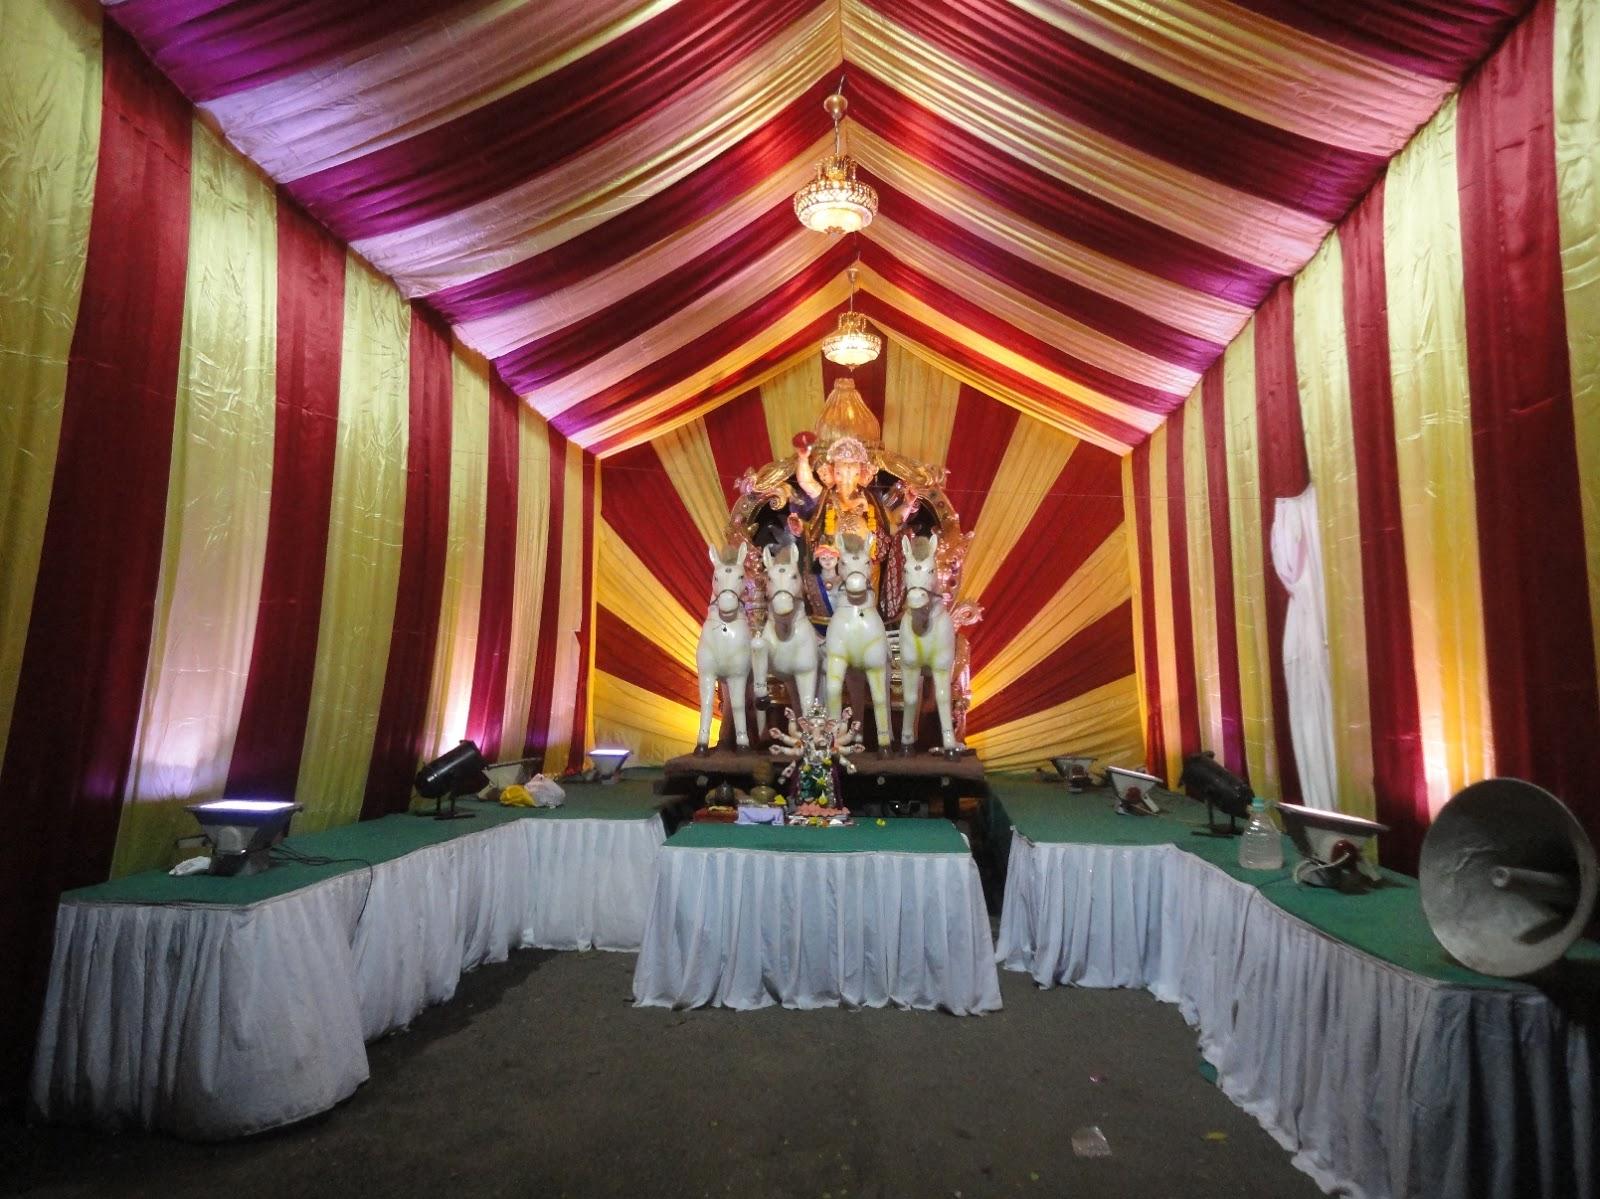 Ganesh Chaturthi 2013 - Ganpati Bappa Images ~ Hindu Festivals